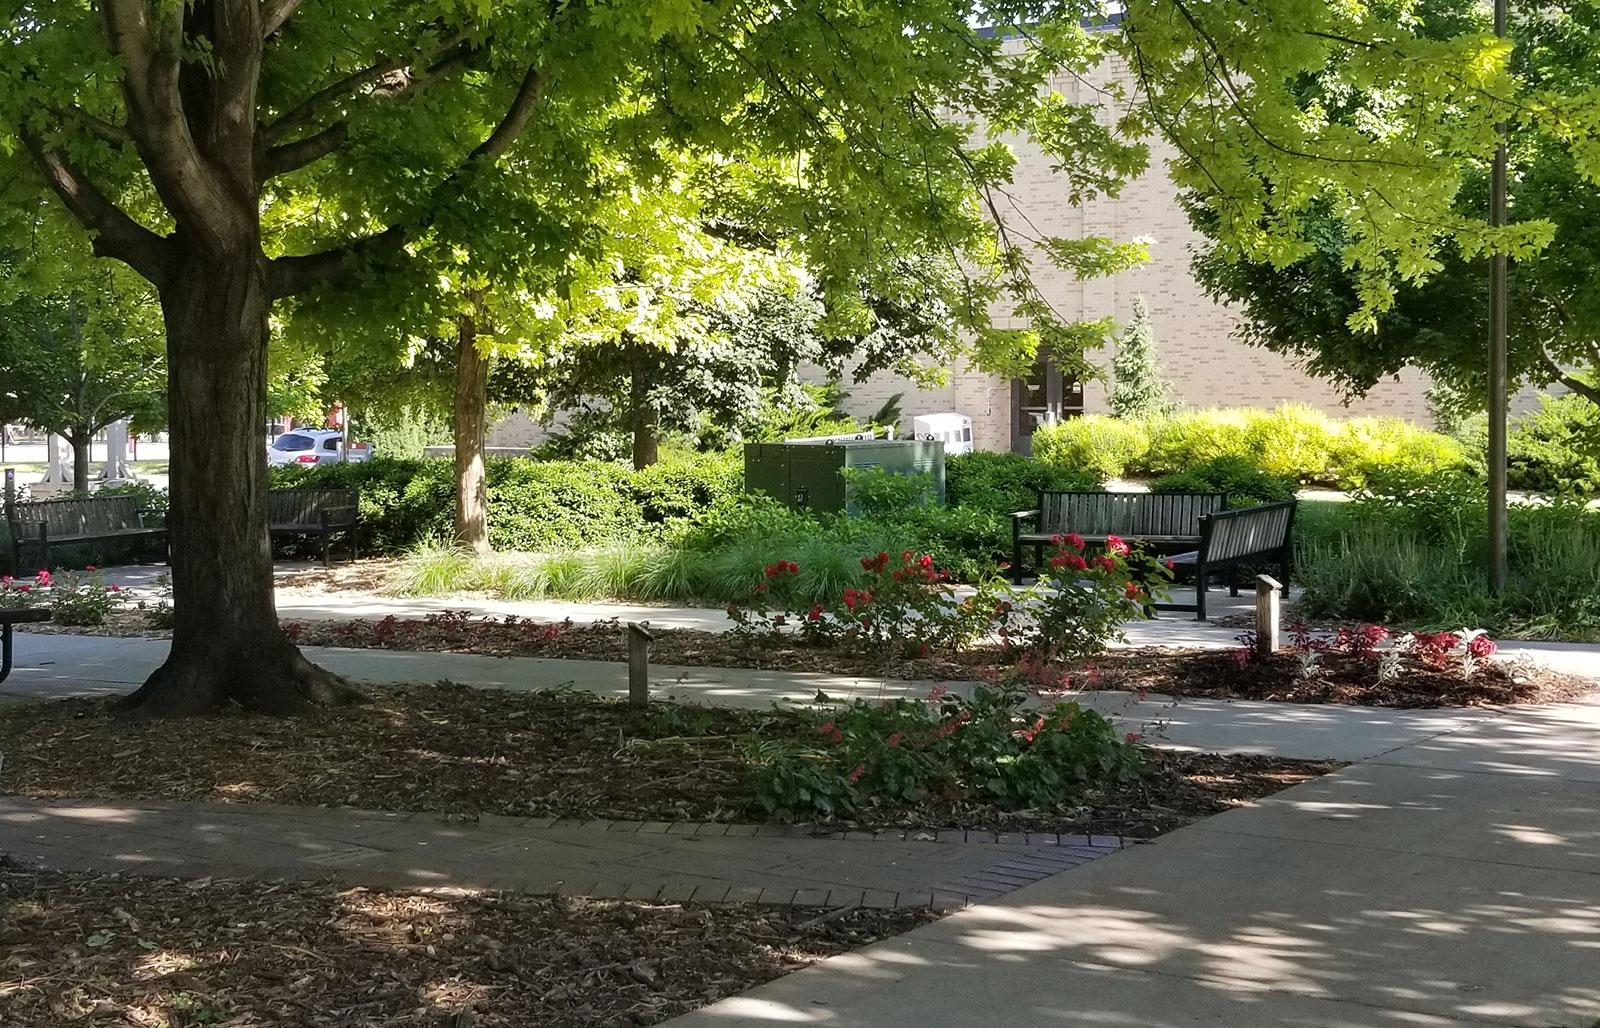 IANR East Campus Courtyard